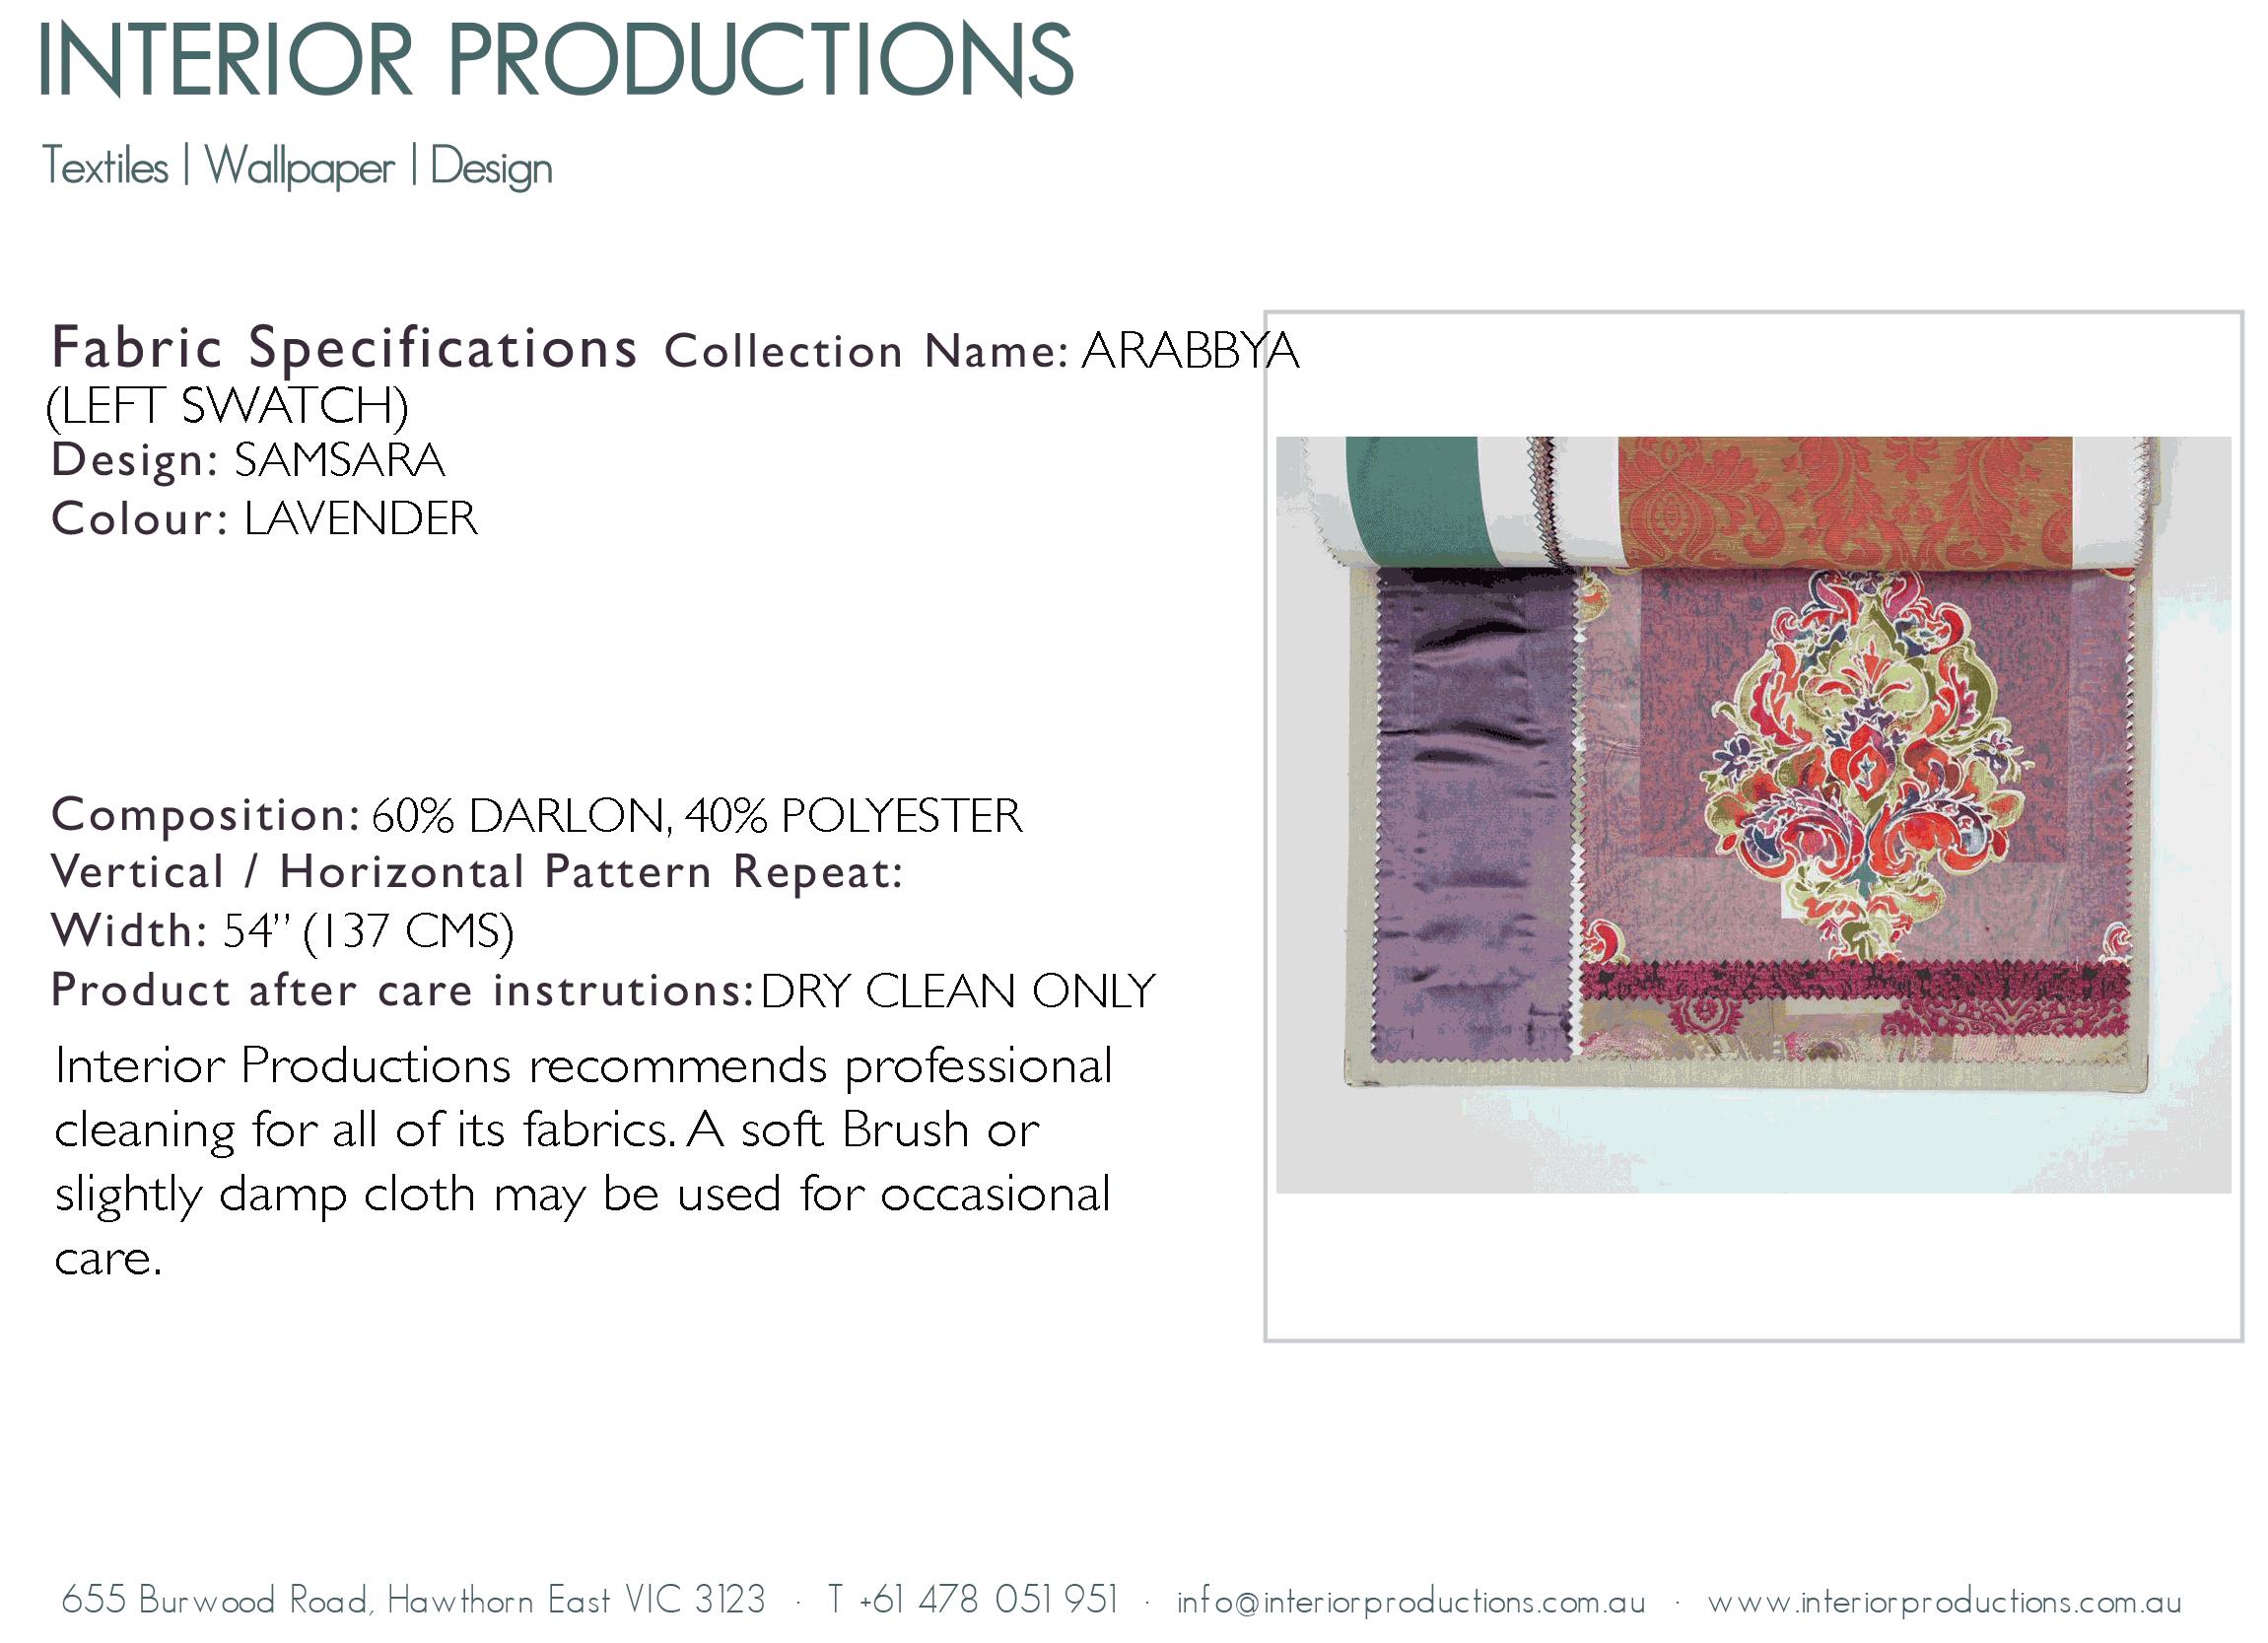 interior_productions_SAMSARA---LAVENDER